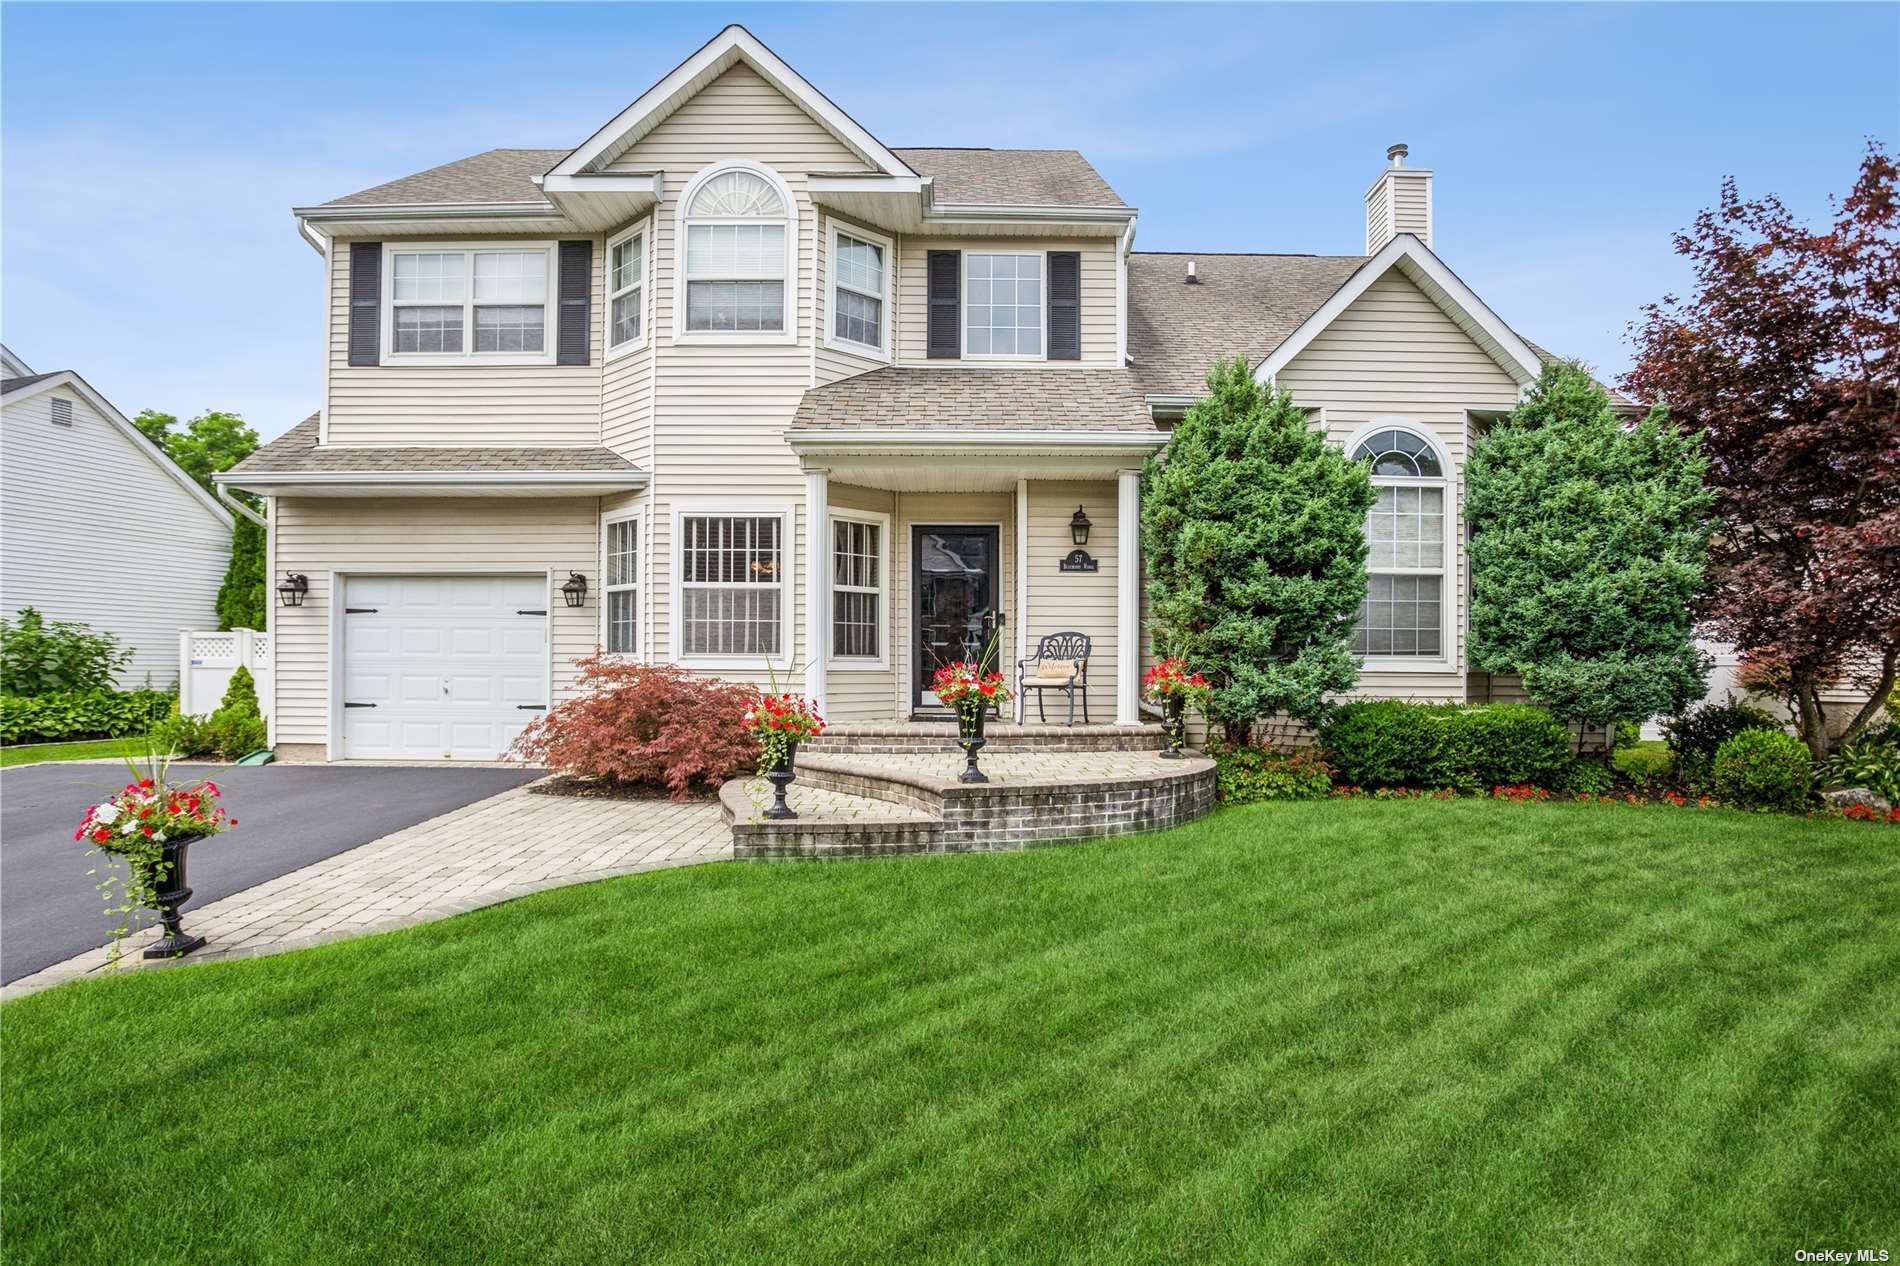 57 Blueberry Ridge Drive, Holtsville, NY 11742 - MLS#: 3330204